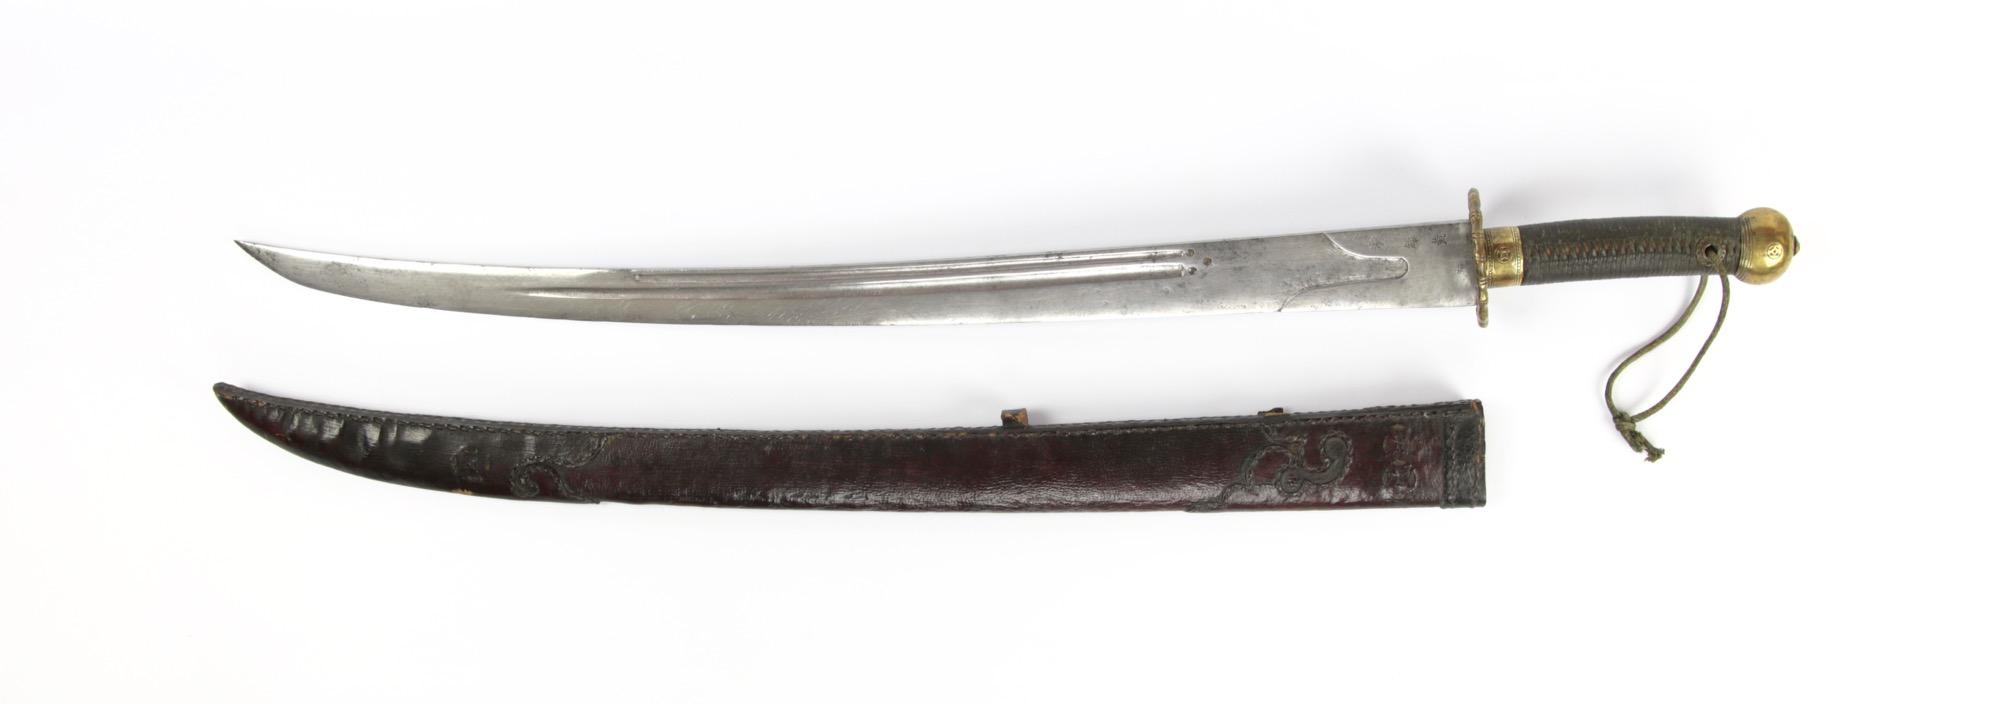 A Chinese southern bannerman saber